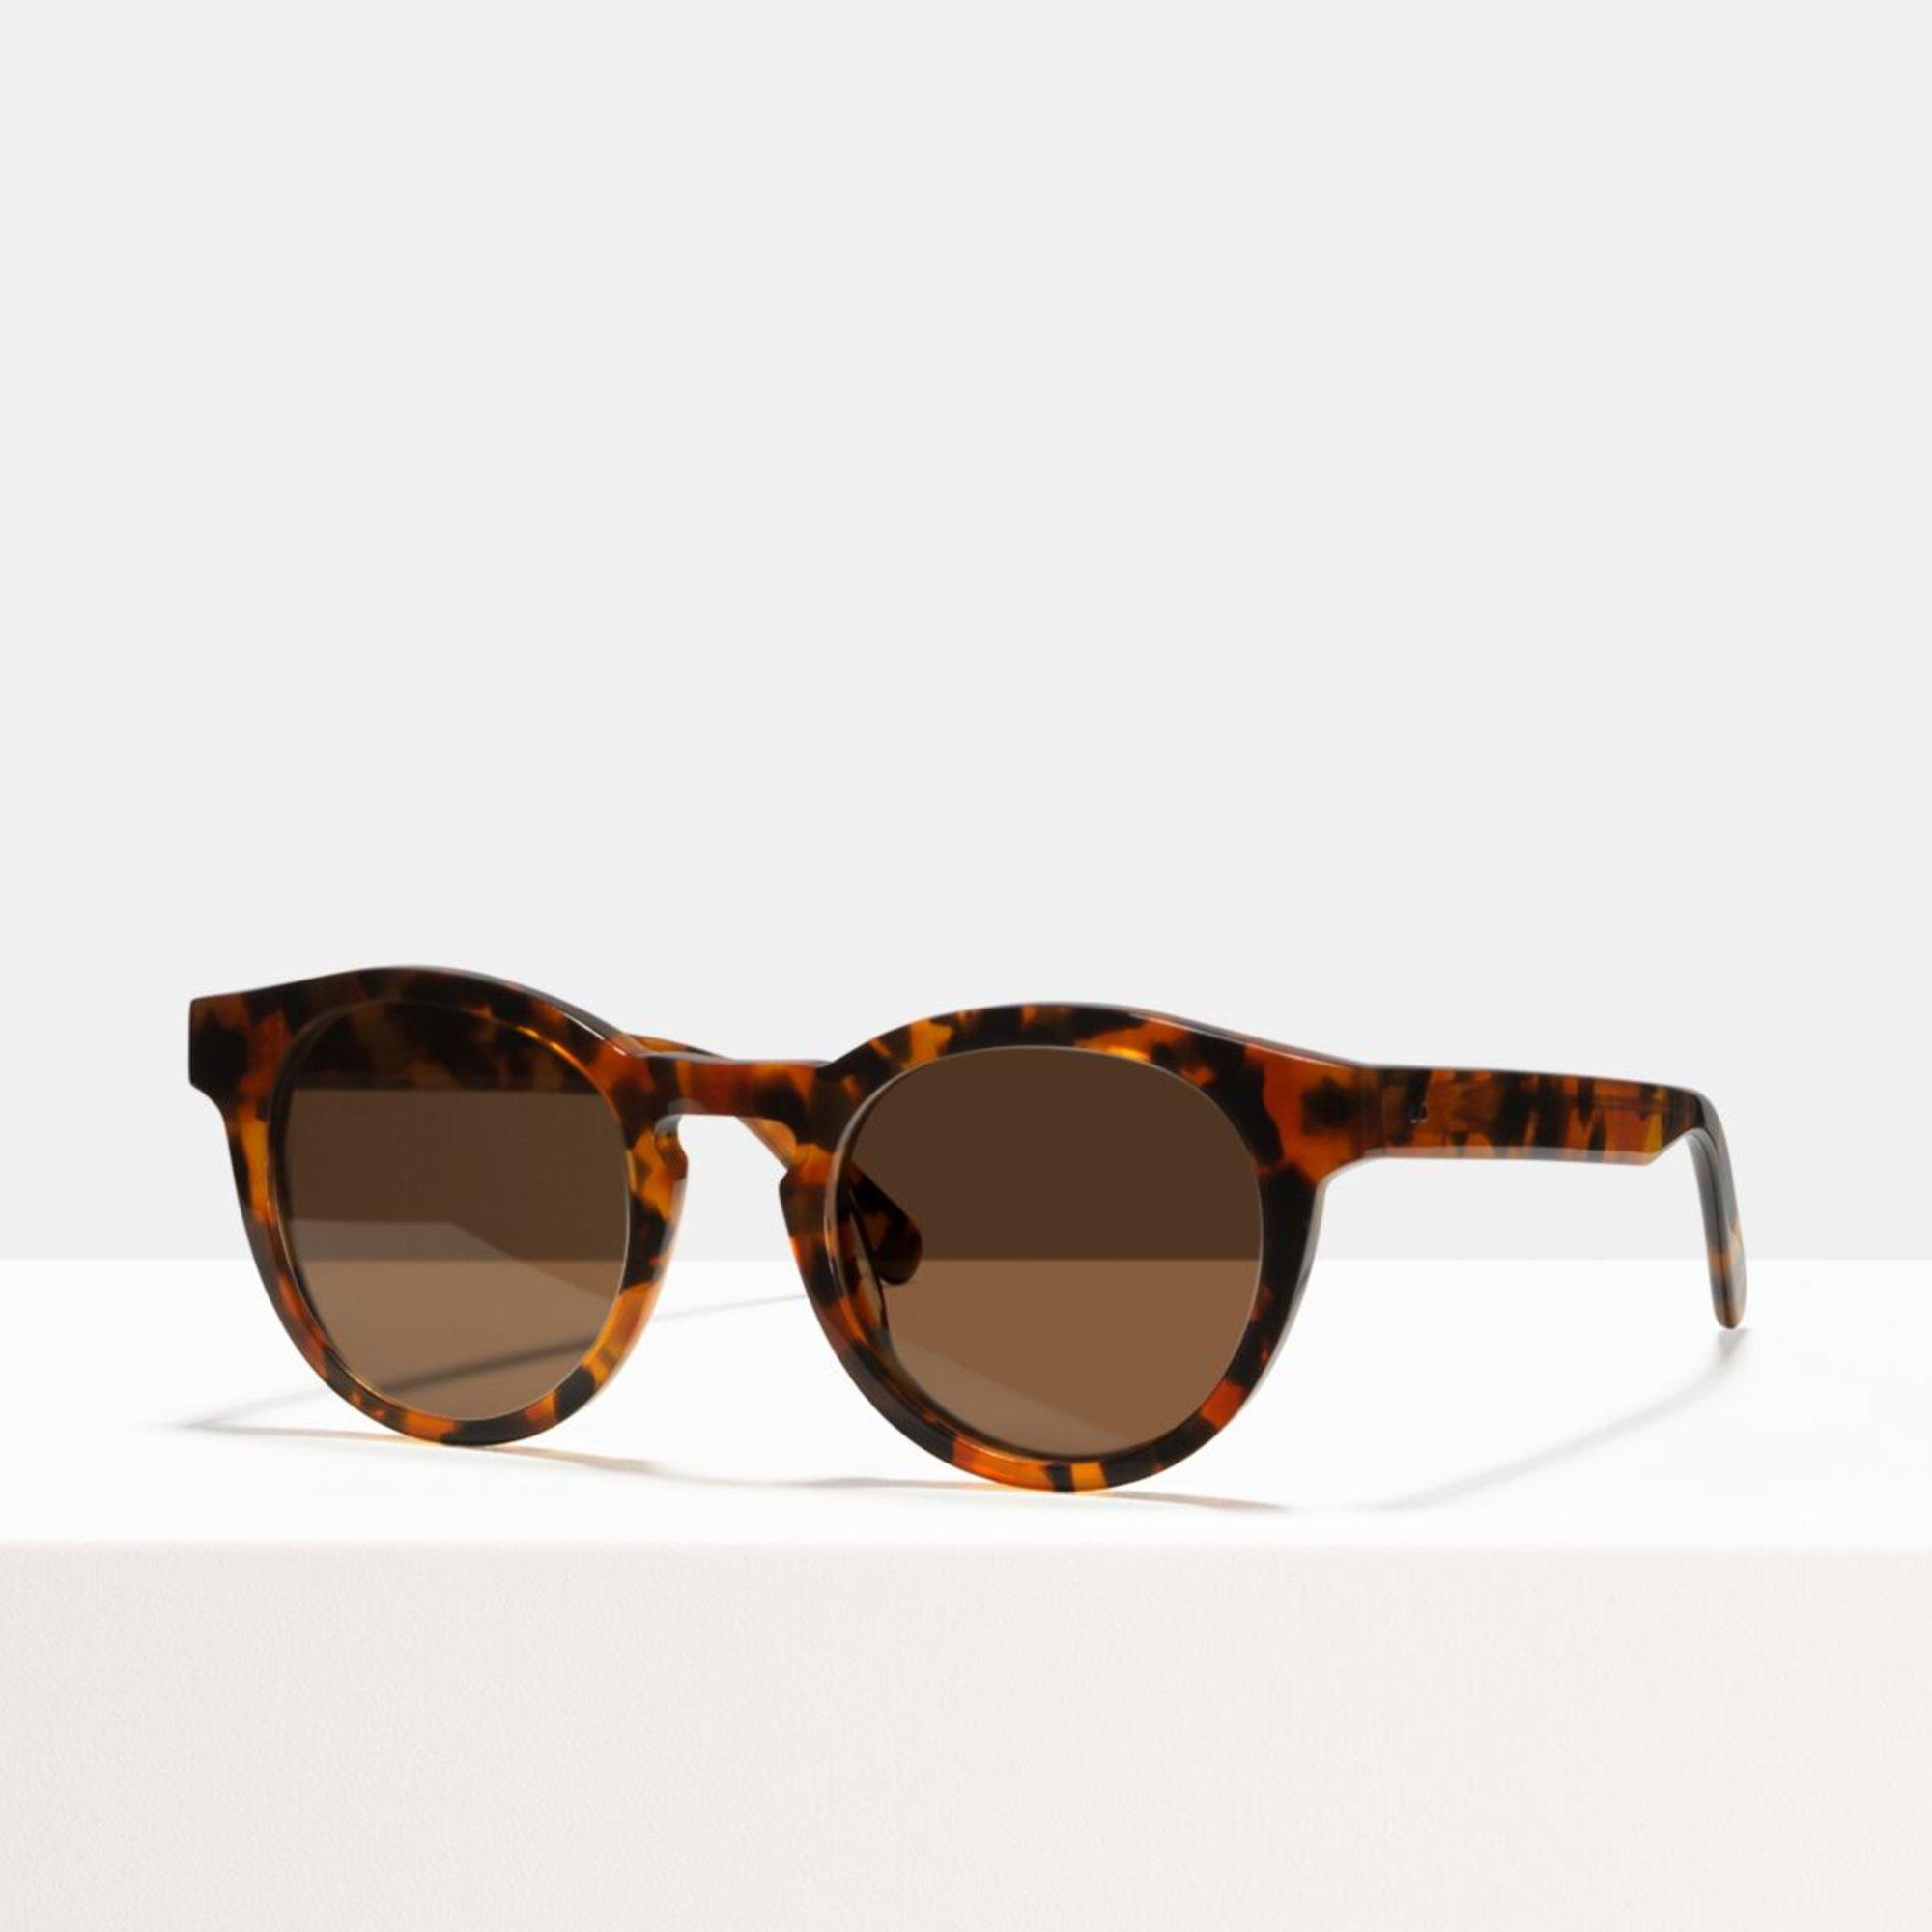 Ace & Tate Sunglasses   round acetate in Black, Brown, Orange, Red